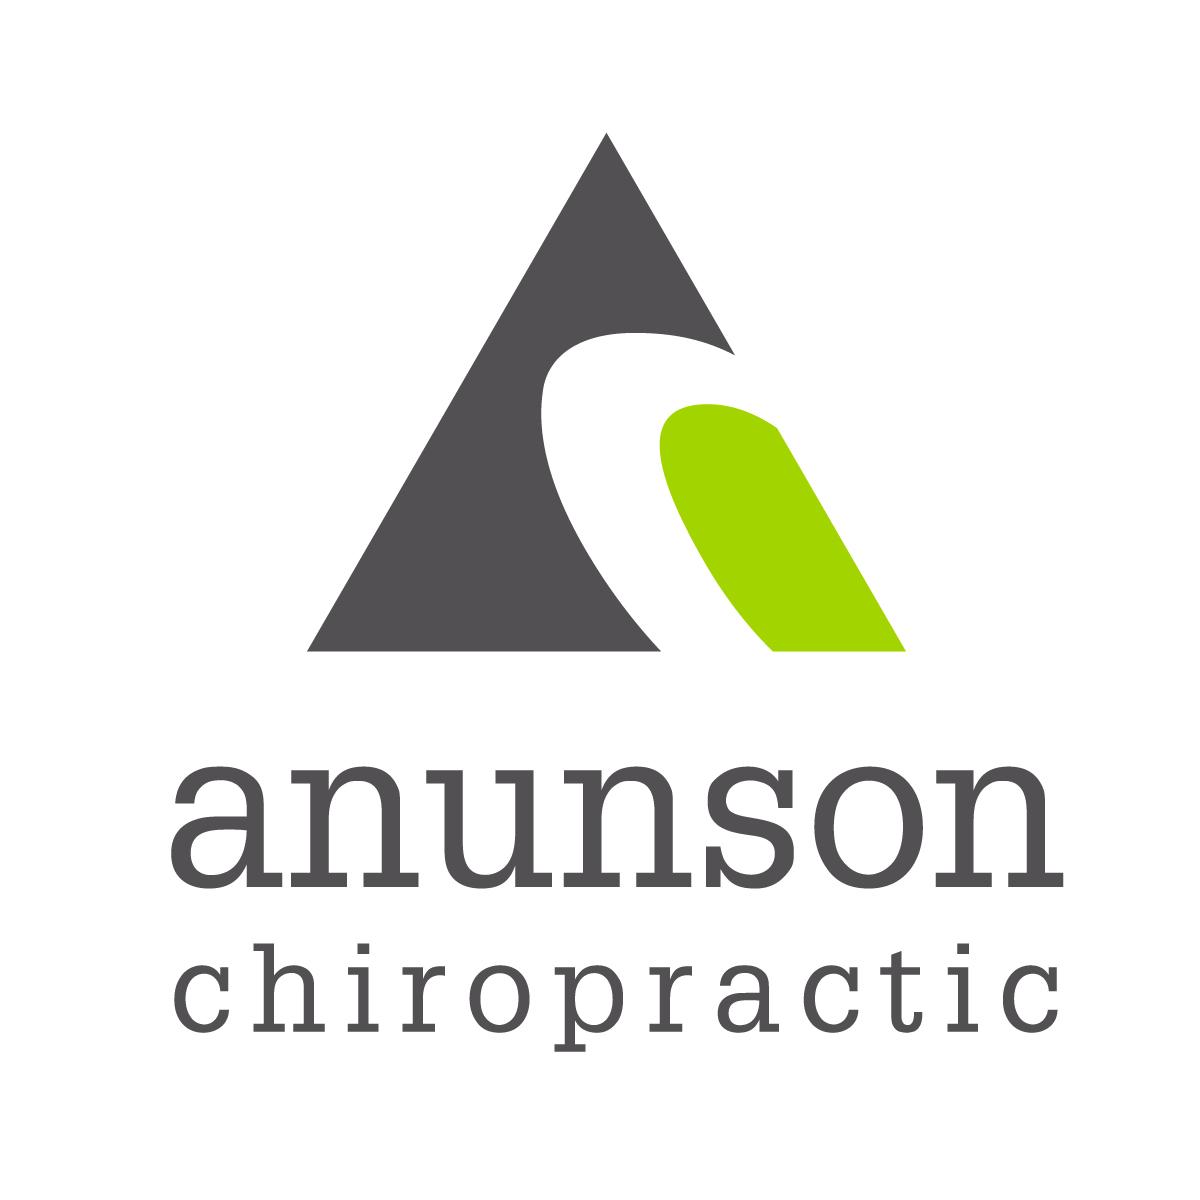 Anunson Chiropractic